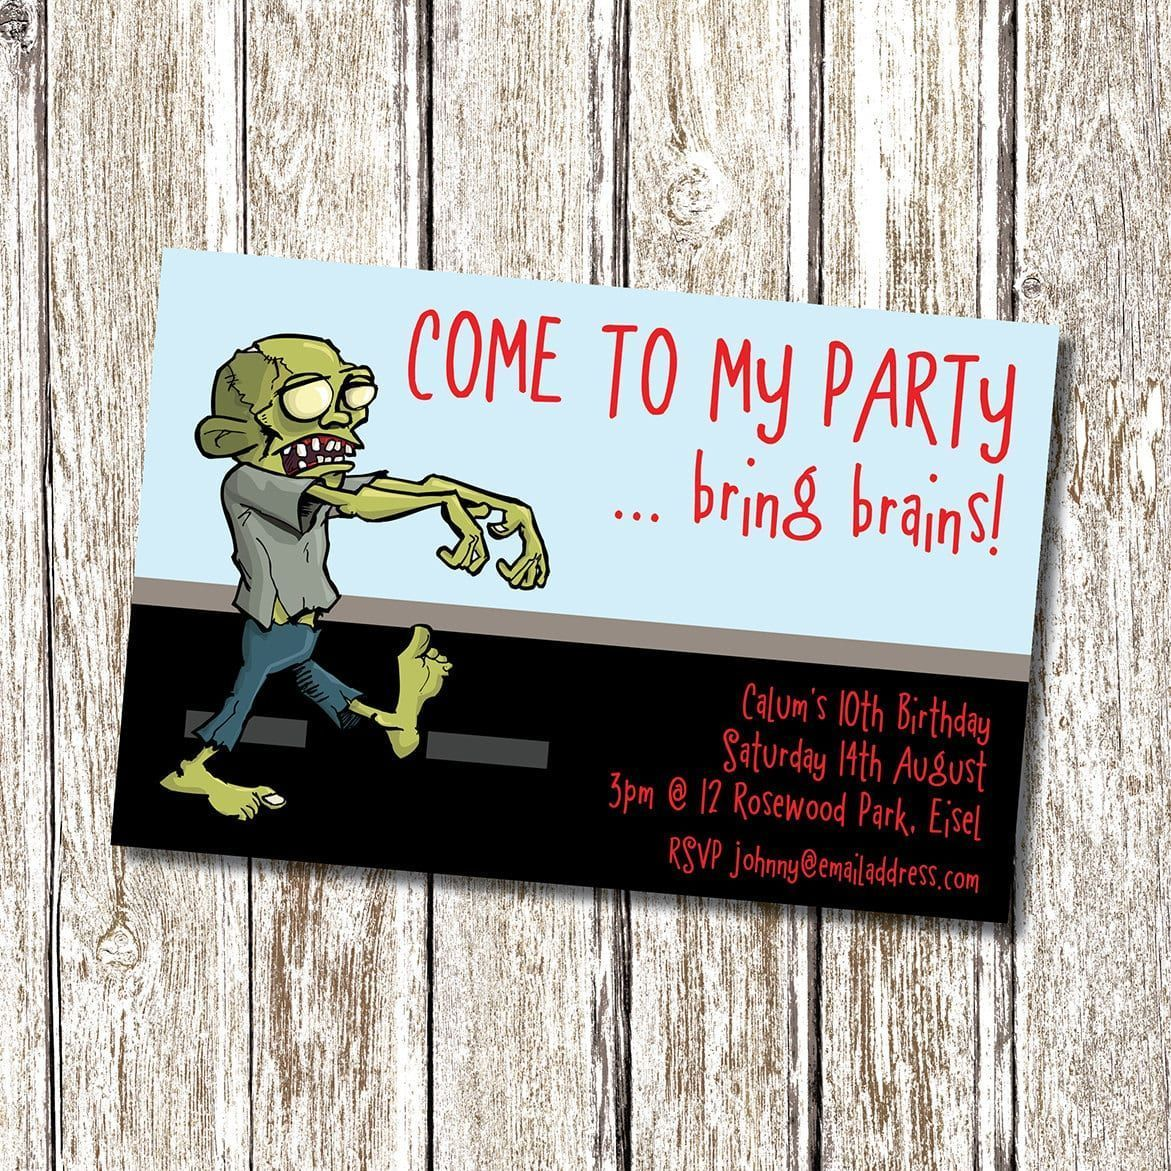 Zombie Birthday Party Invitation Template #zombieapocalypseparty